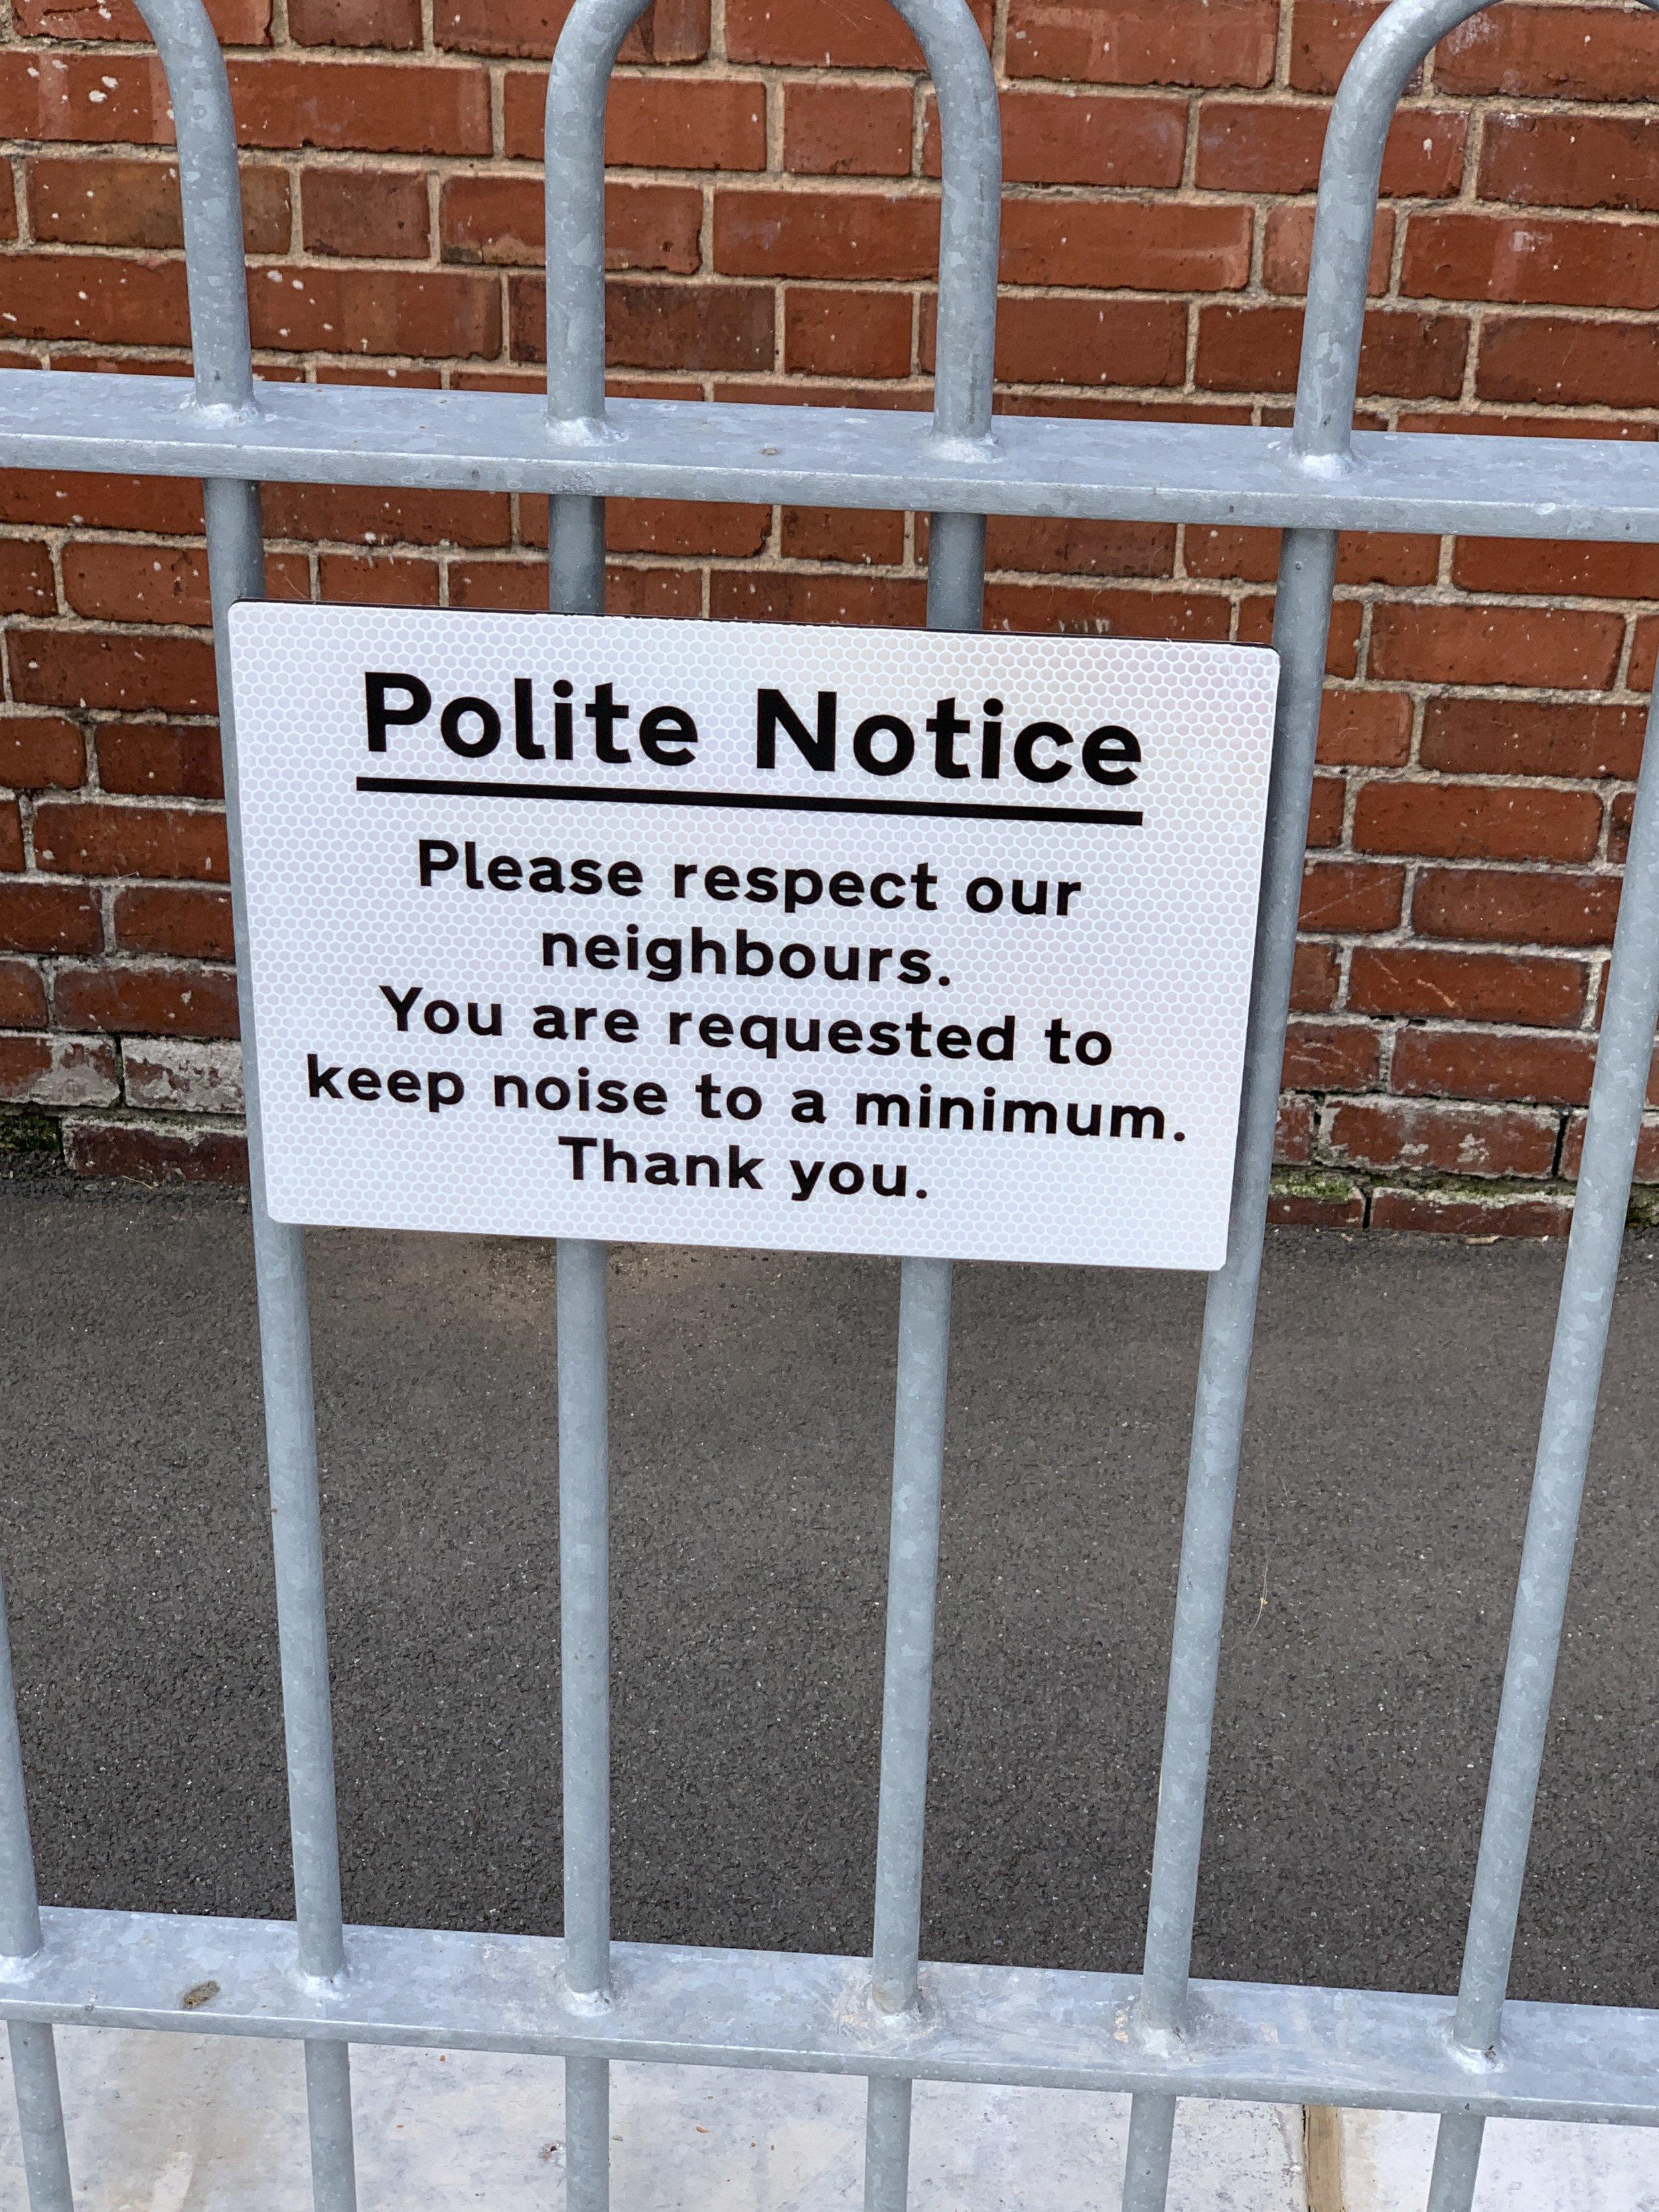 Seen at Kenilworth Station.